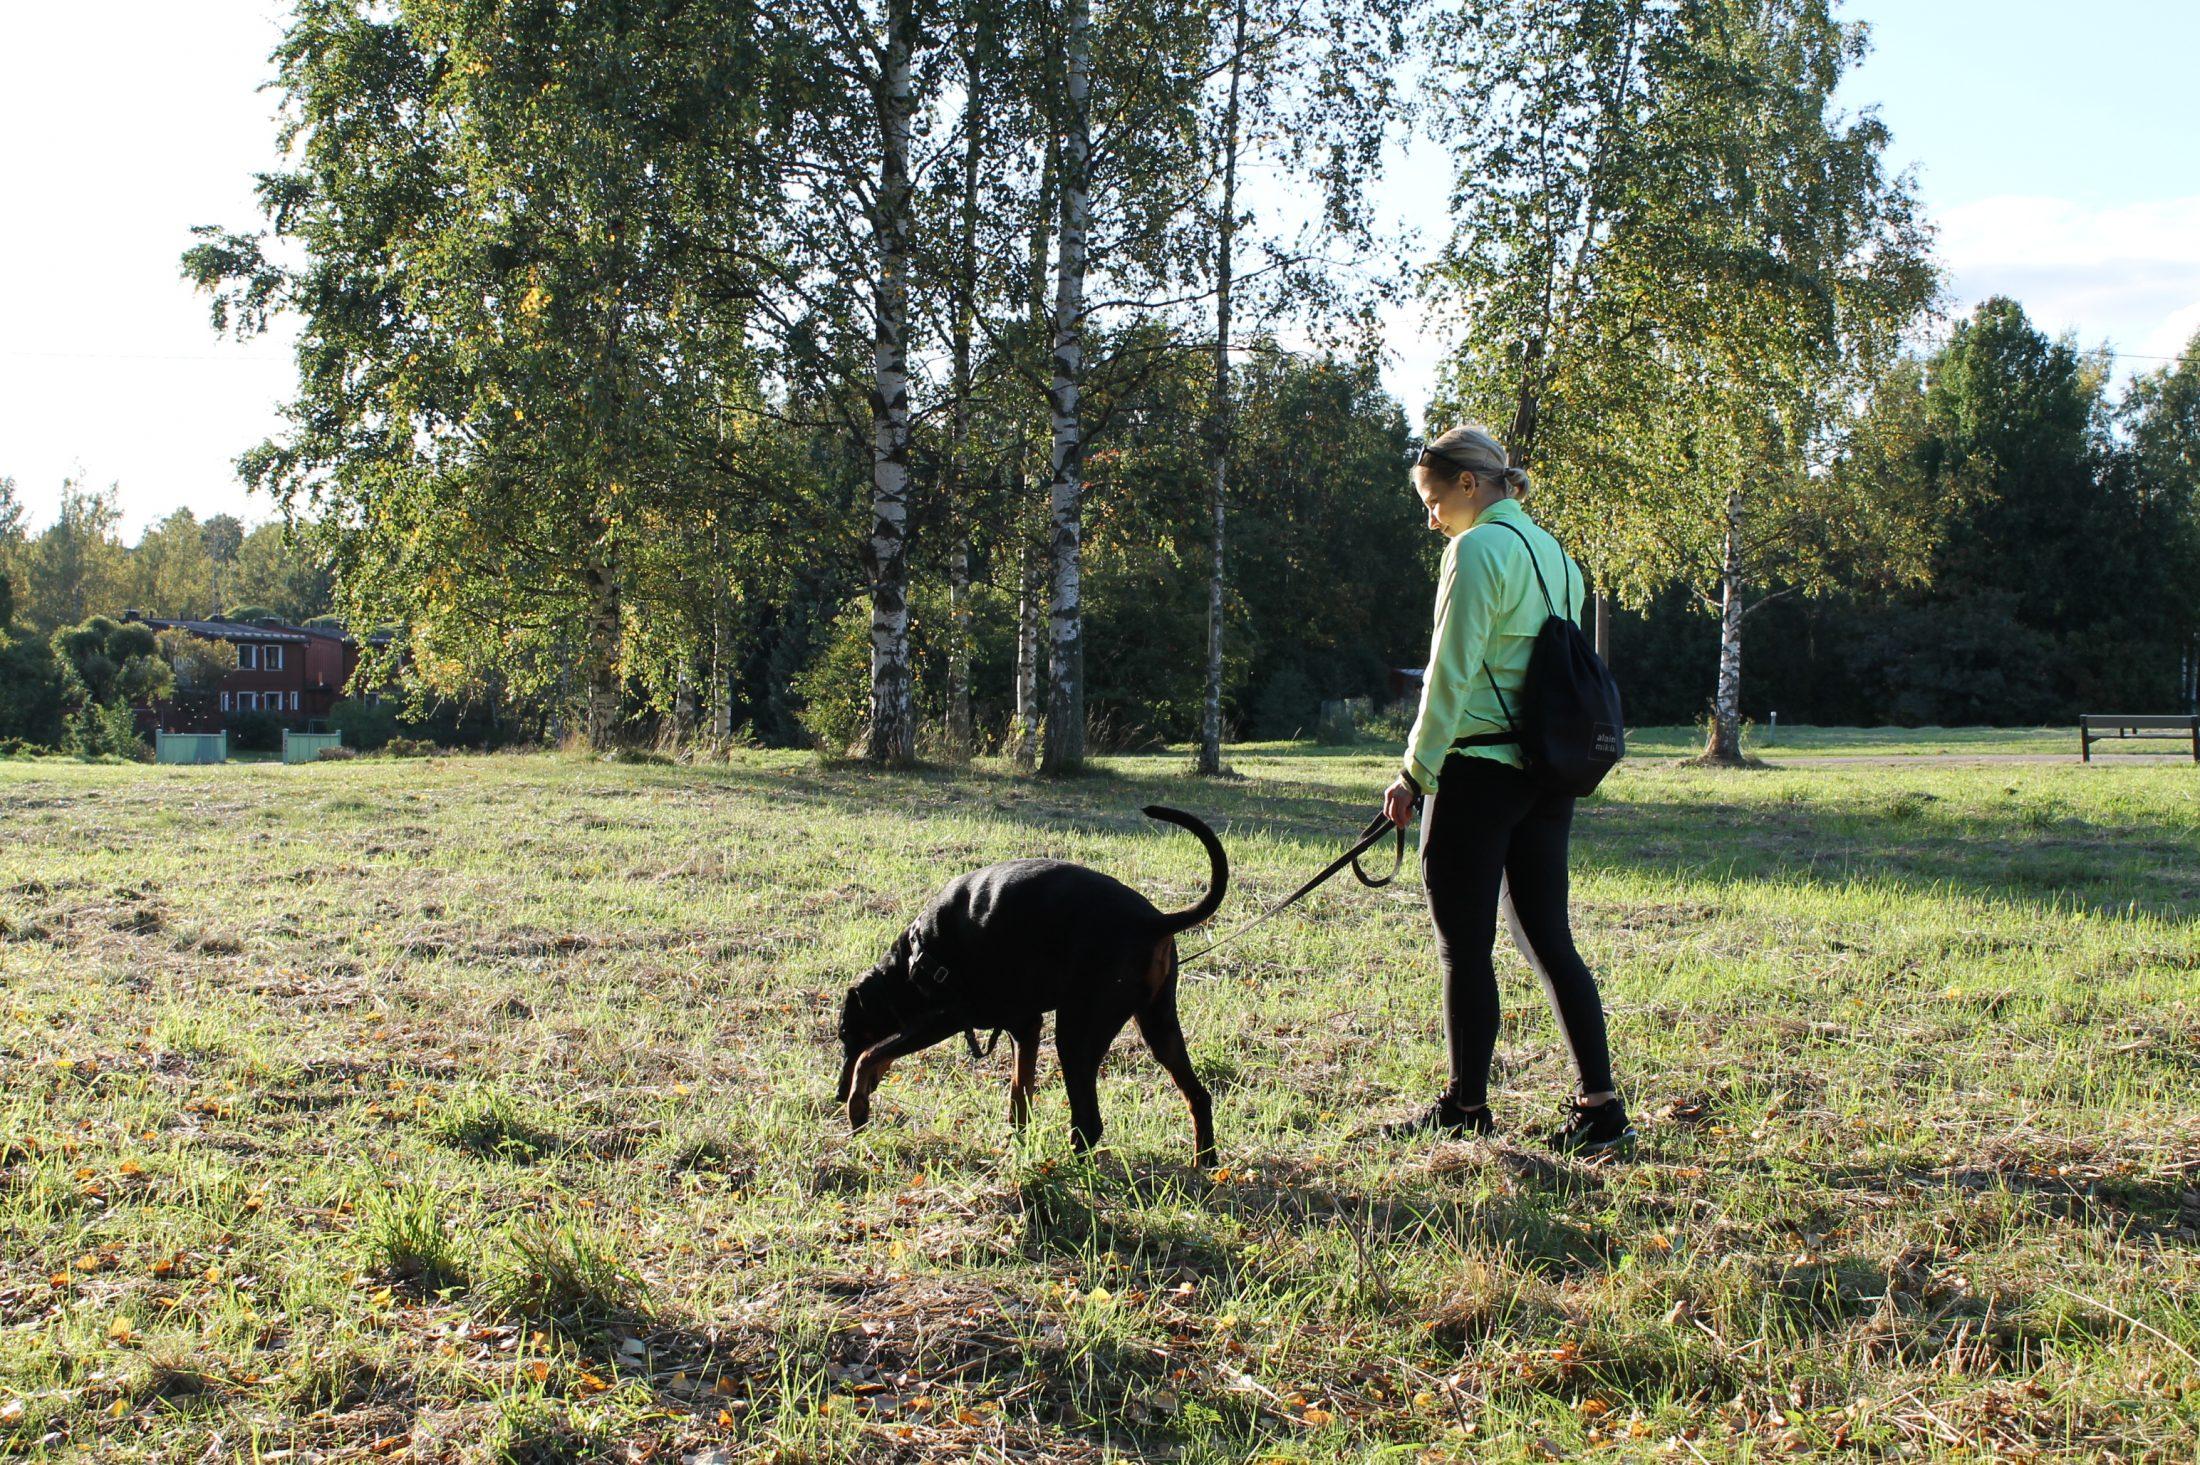 Jälkikurssi, makkarajälki ja jäljen alkeet Helsinki